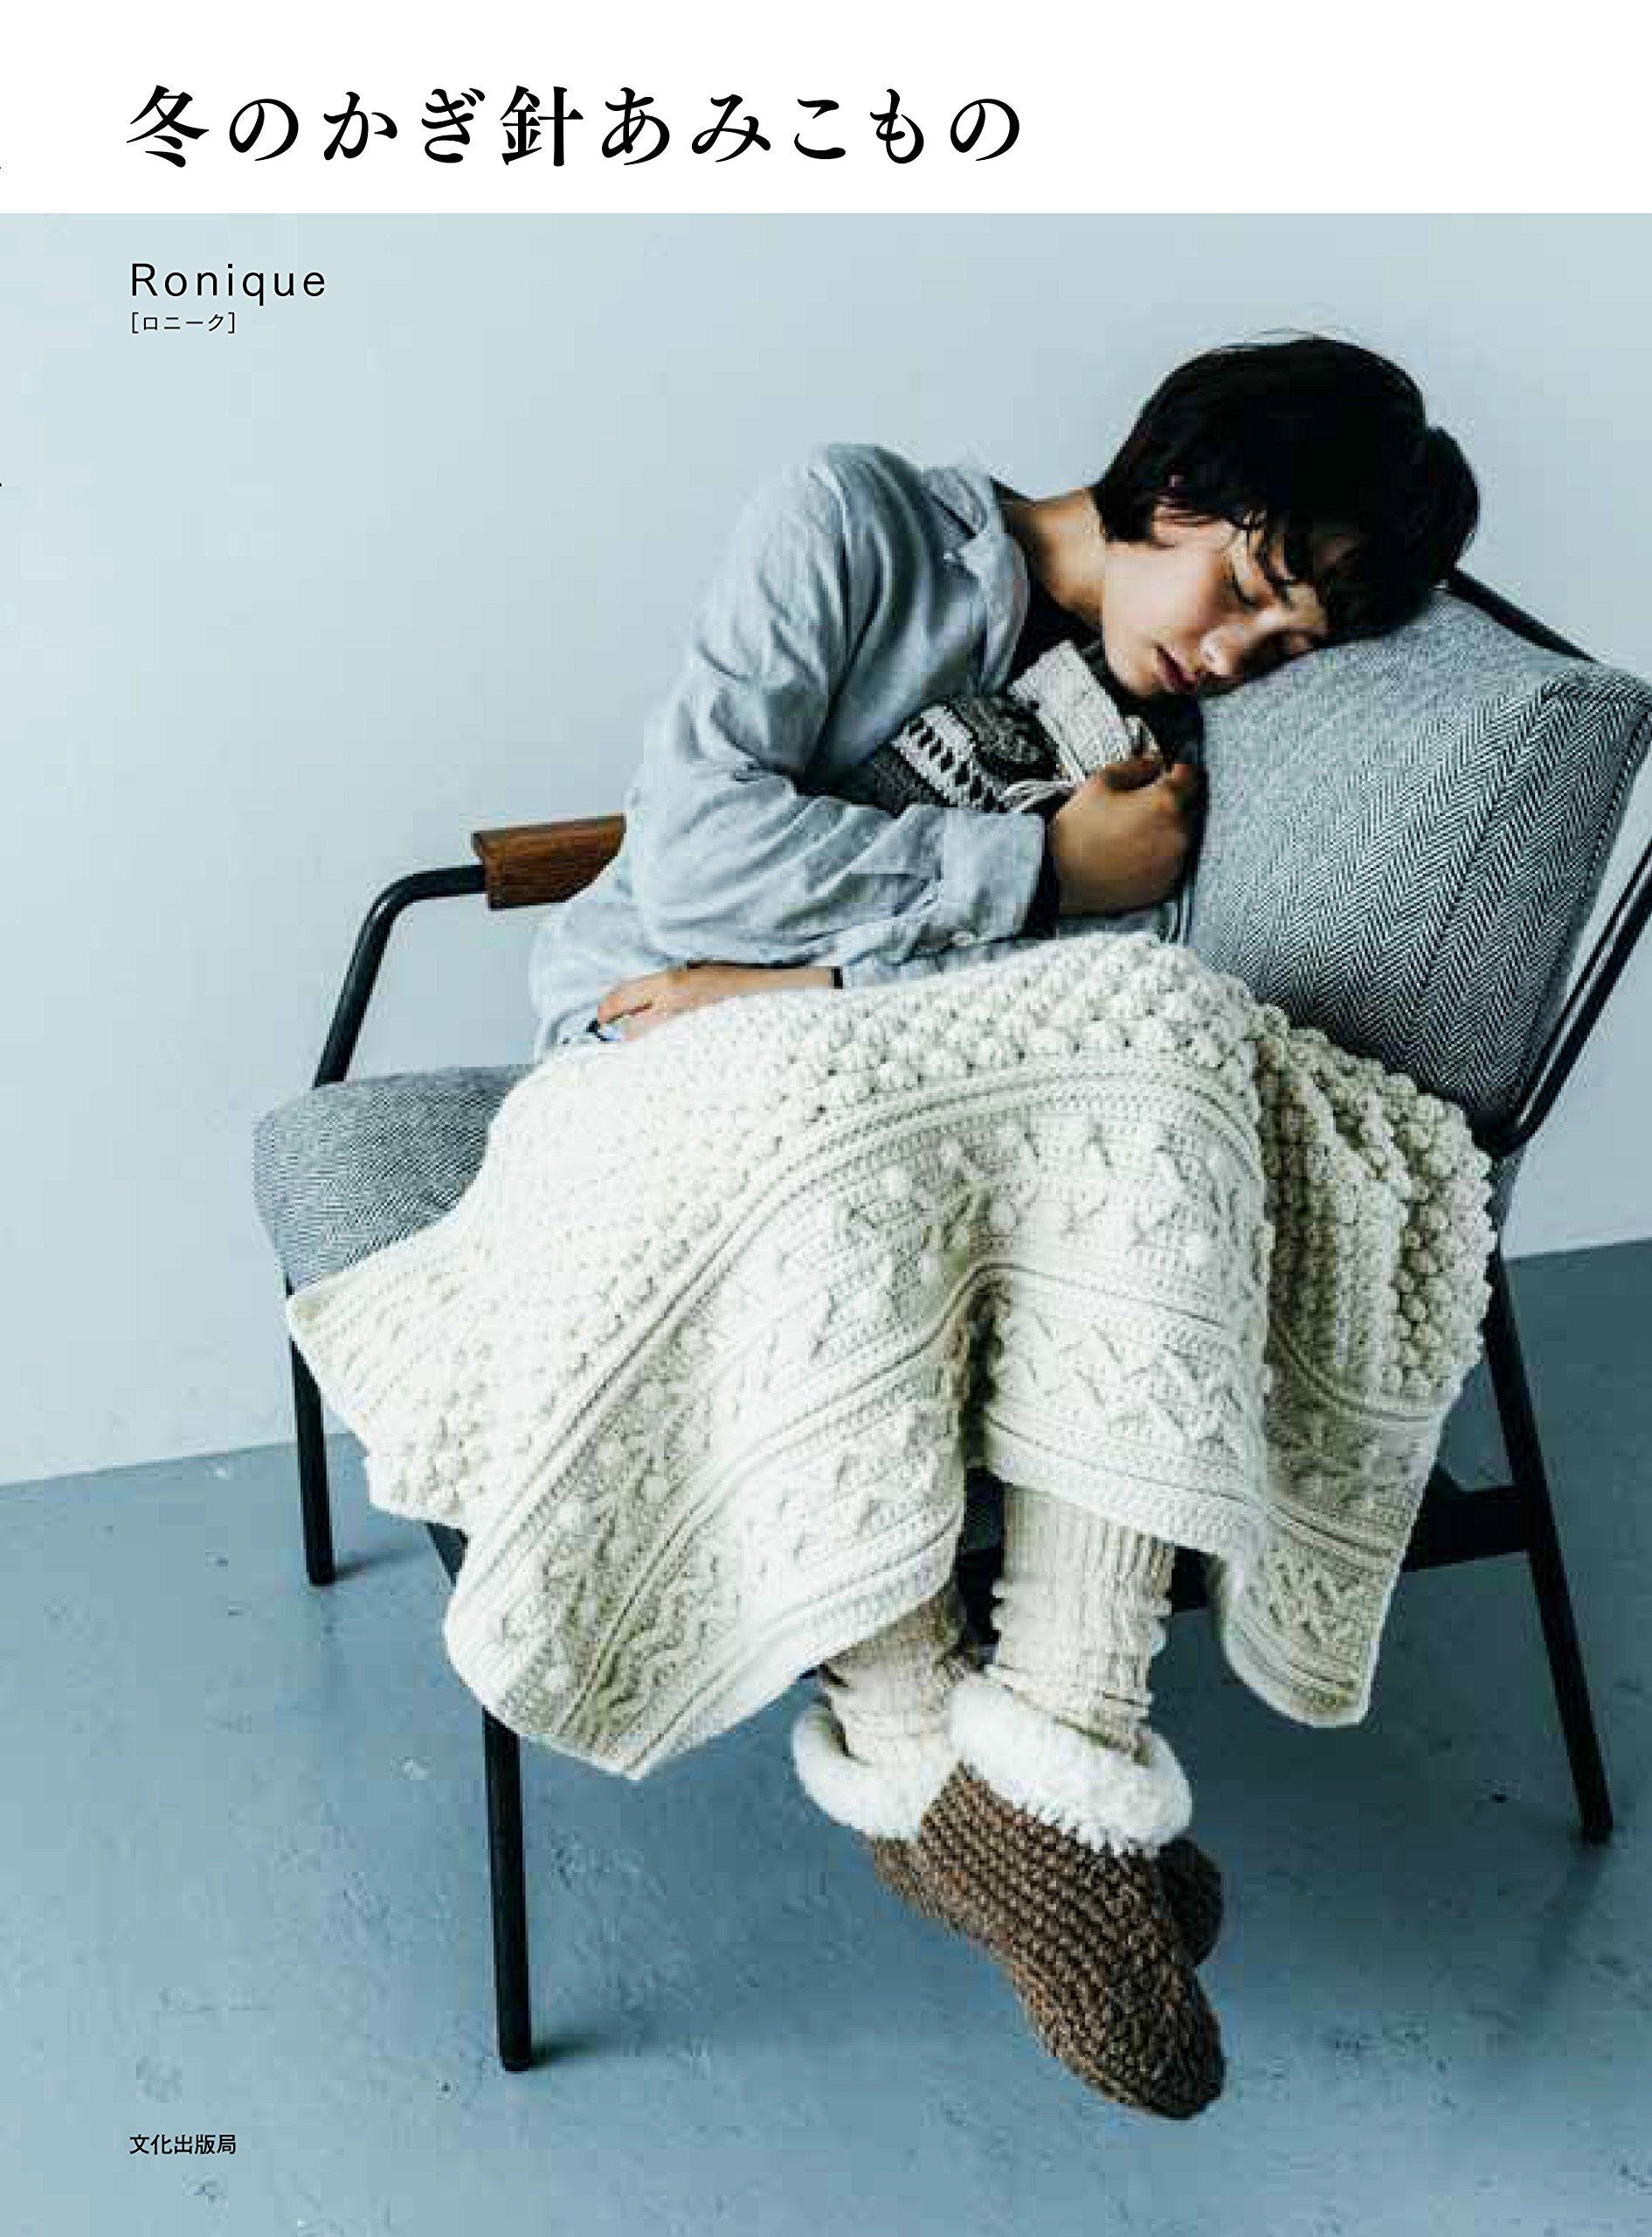 Winter Crochet Anchor - Ronique